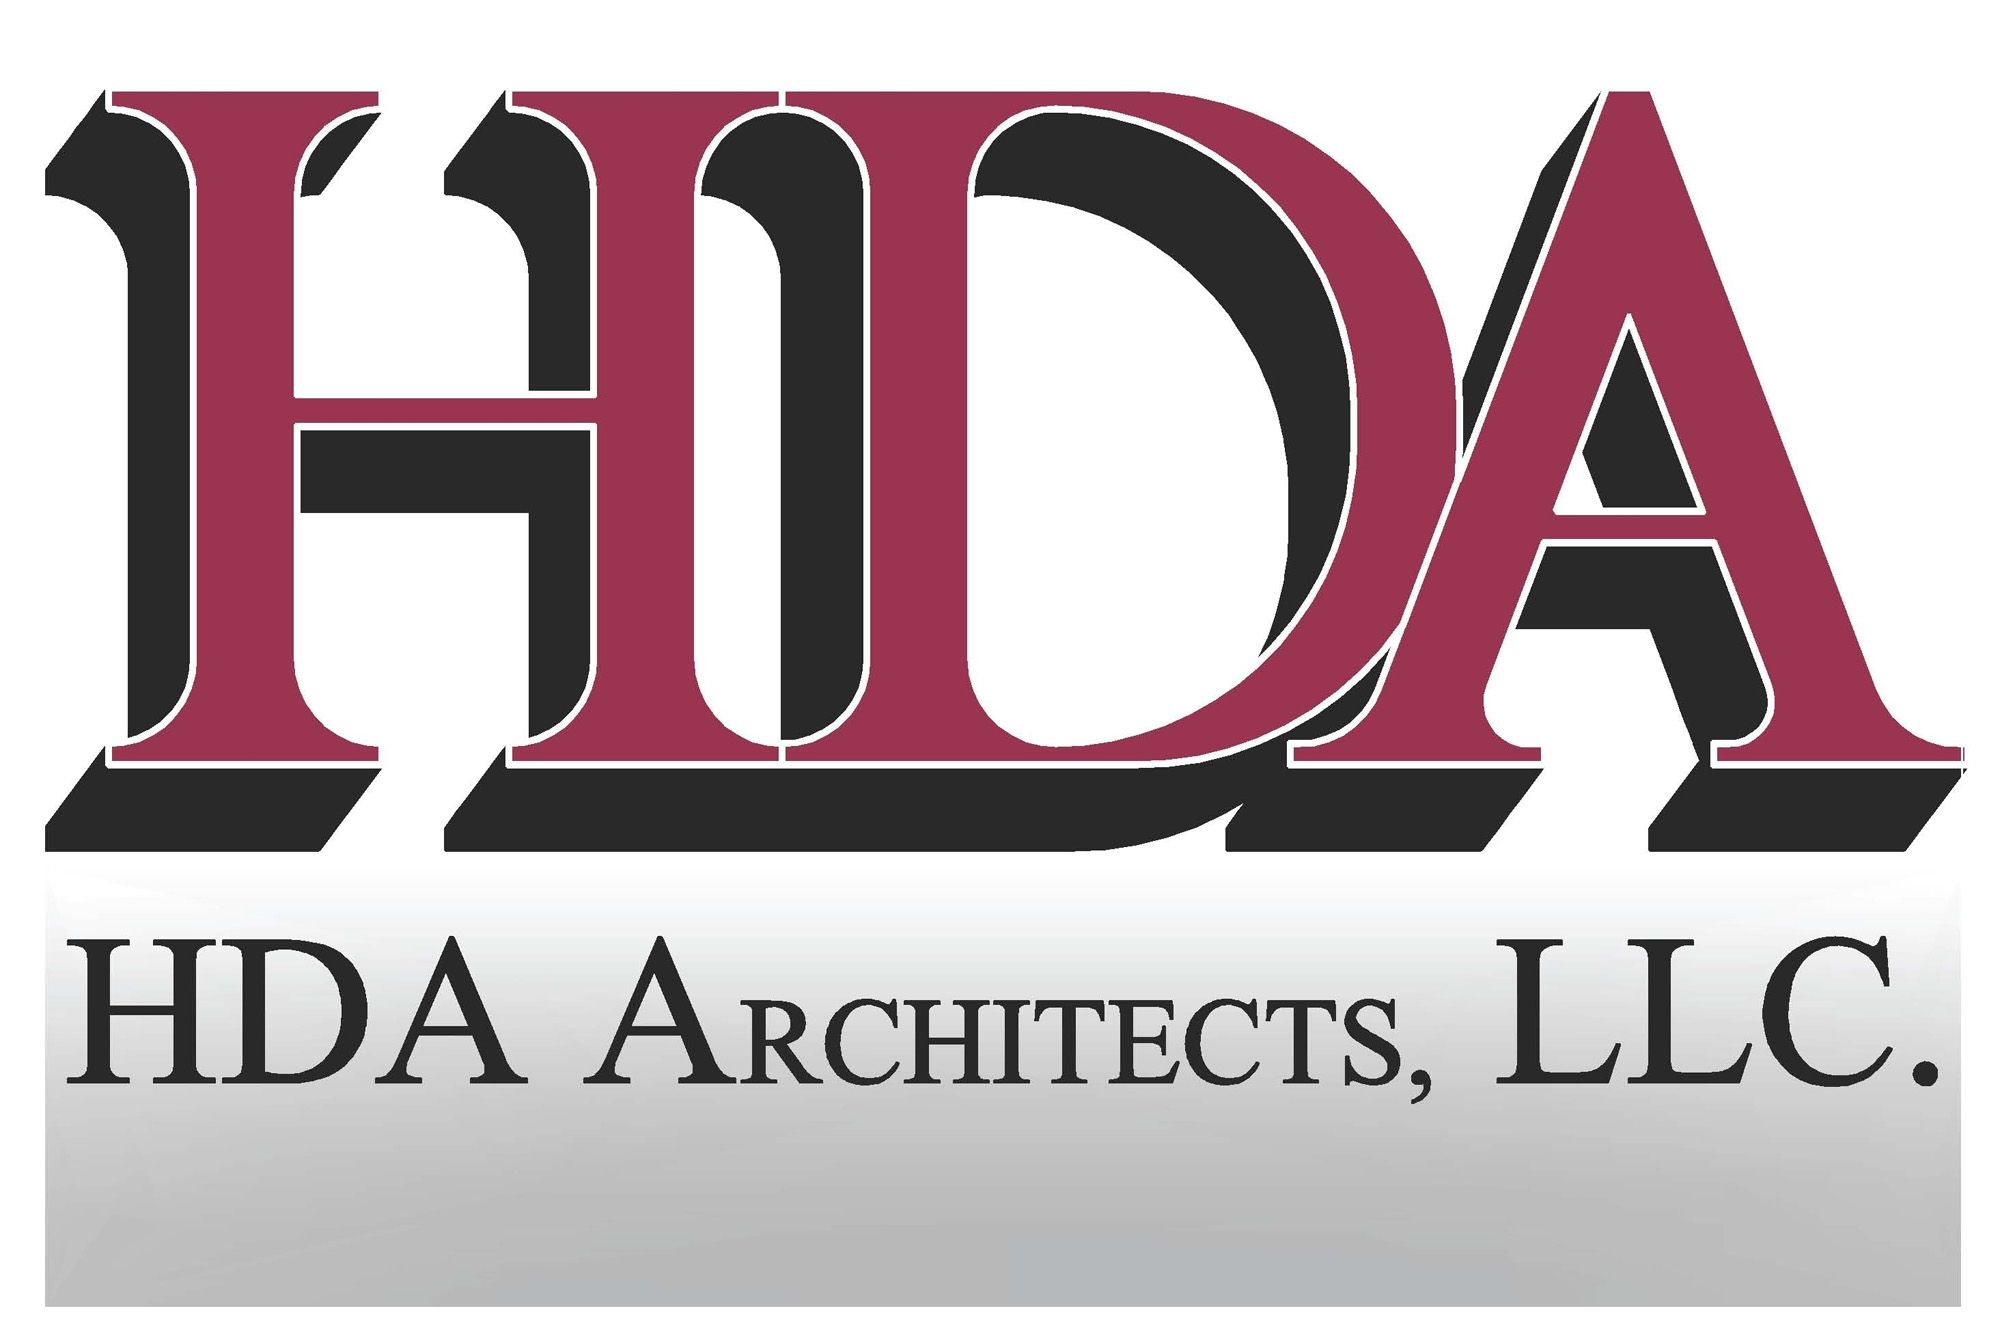 HDA Architects, LLC.